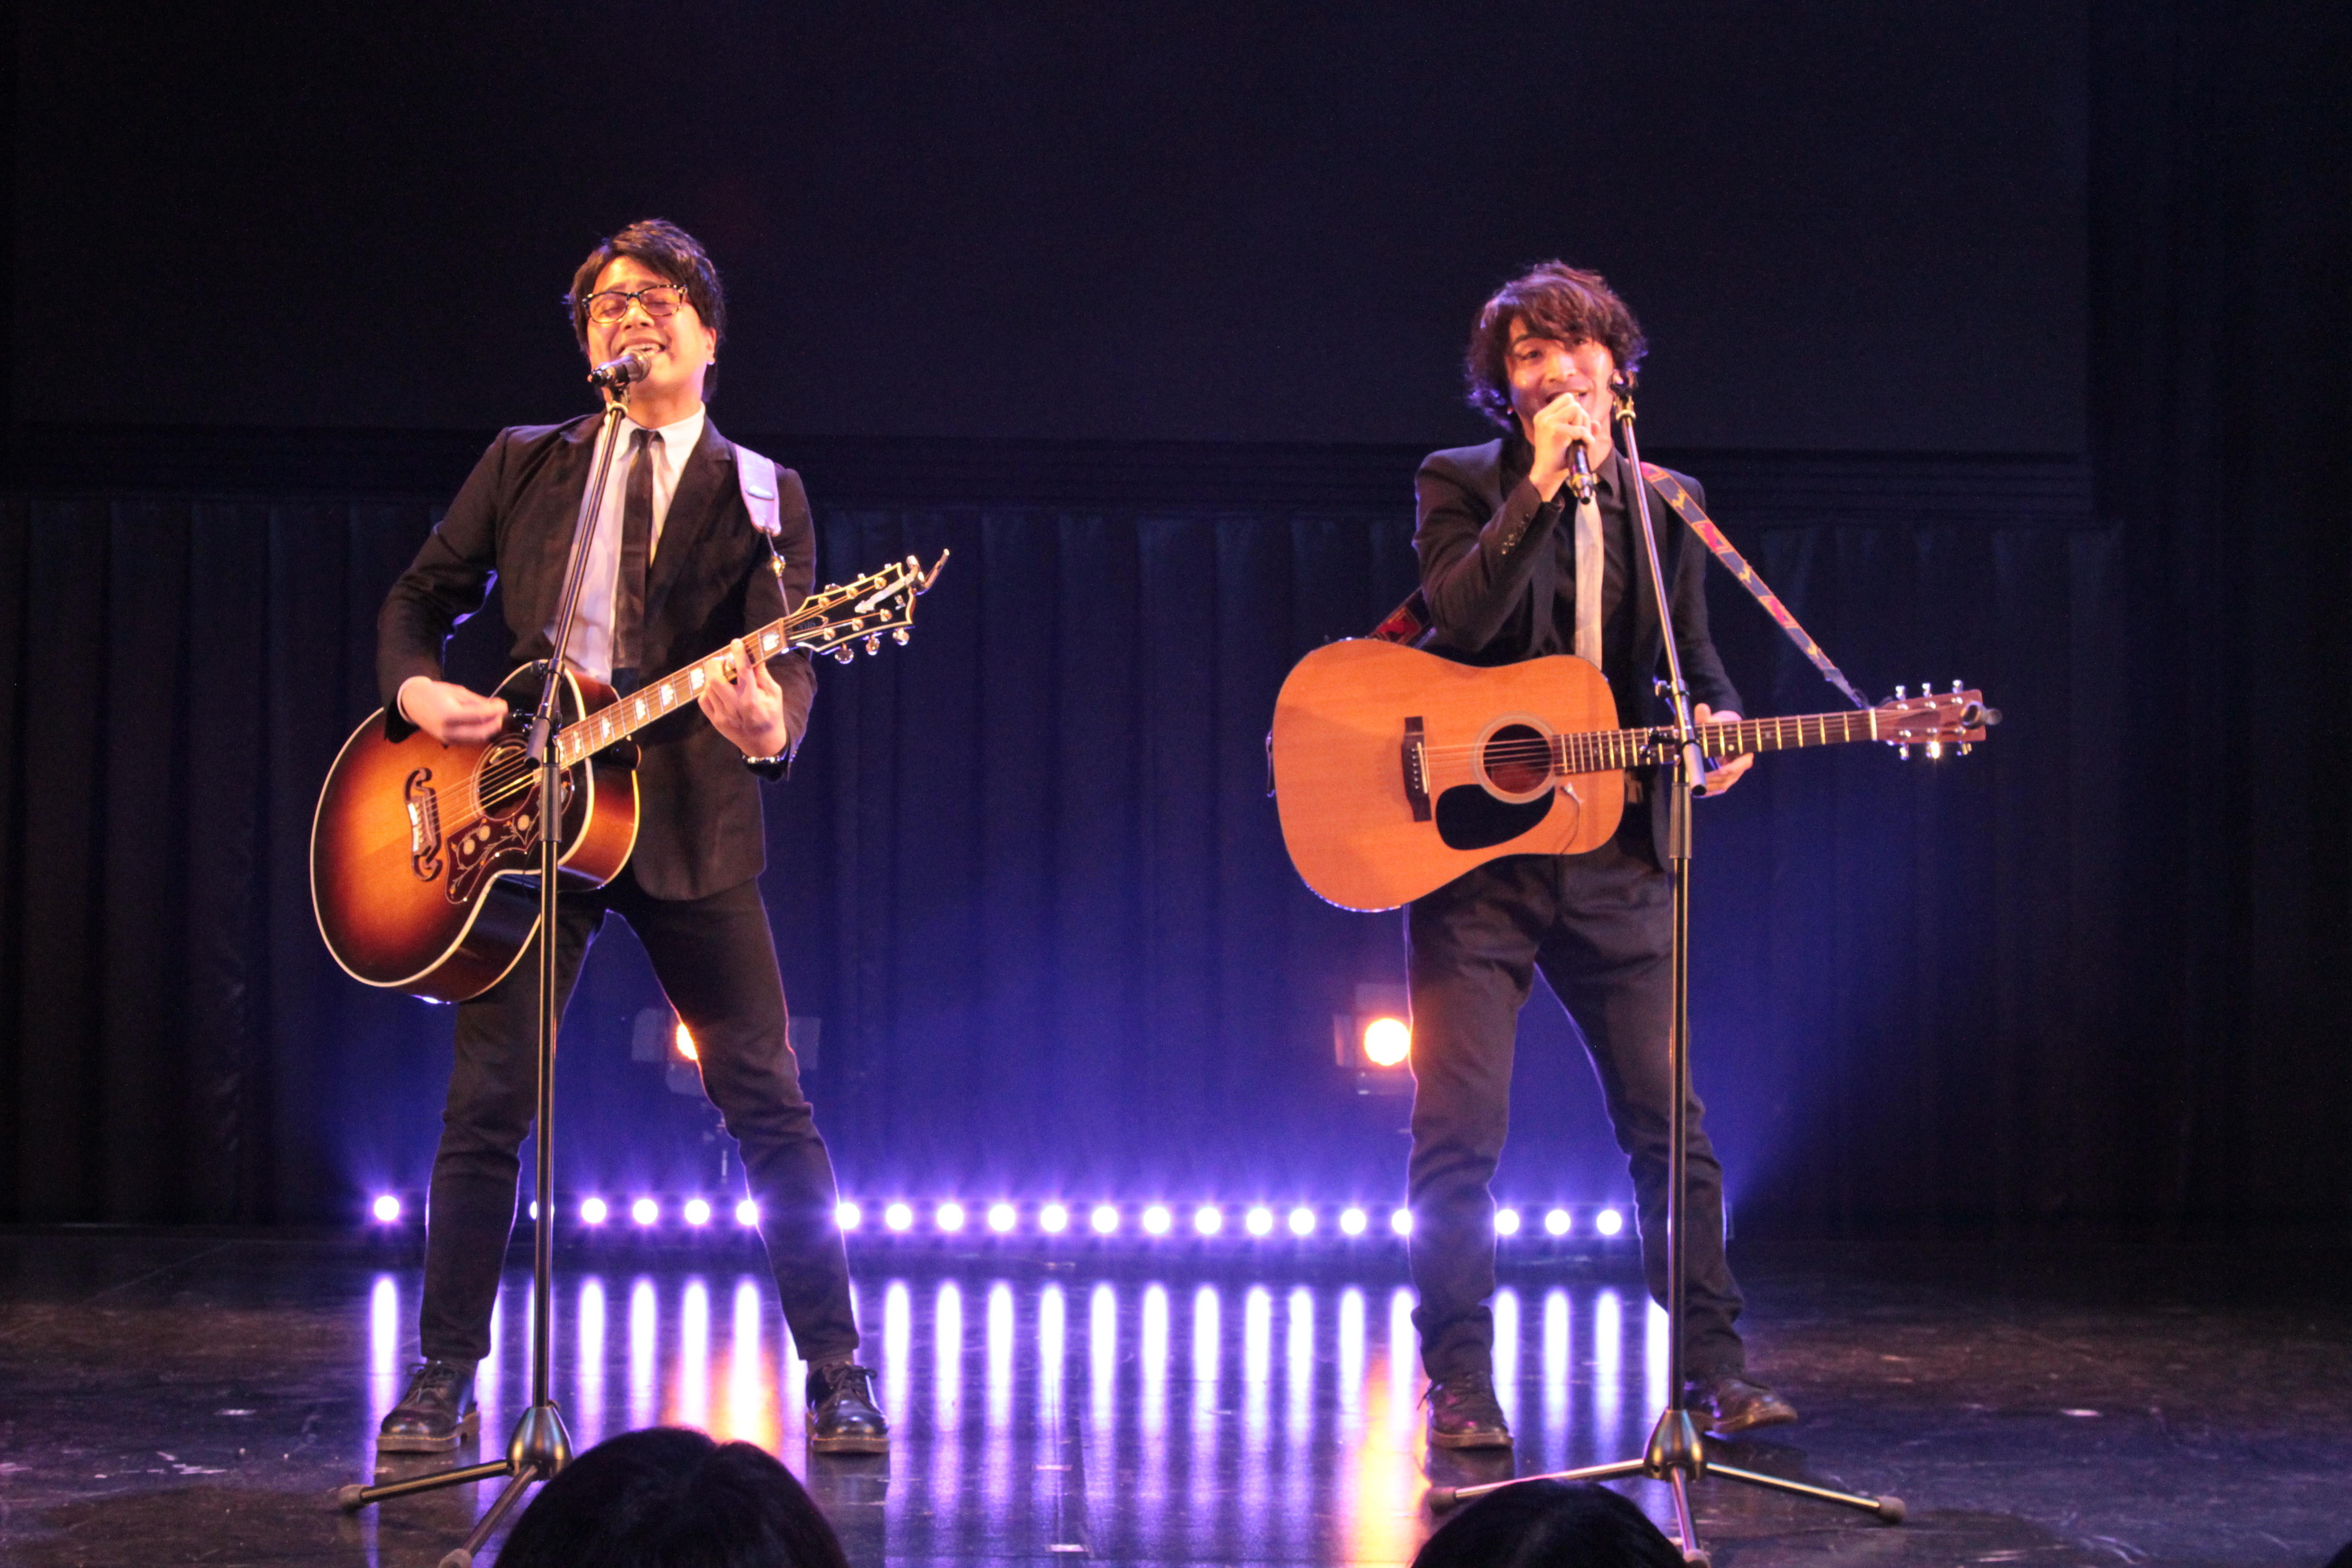 http://news.yoshimoto.co.jp/20190107133831-cf6790a0f20730d45d6623205bb877463b94b71b.jpg